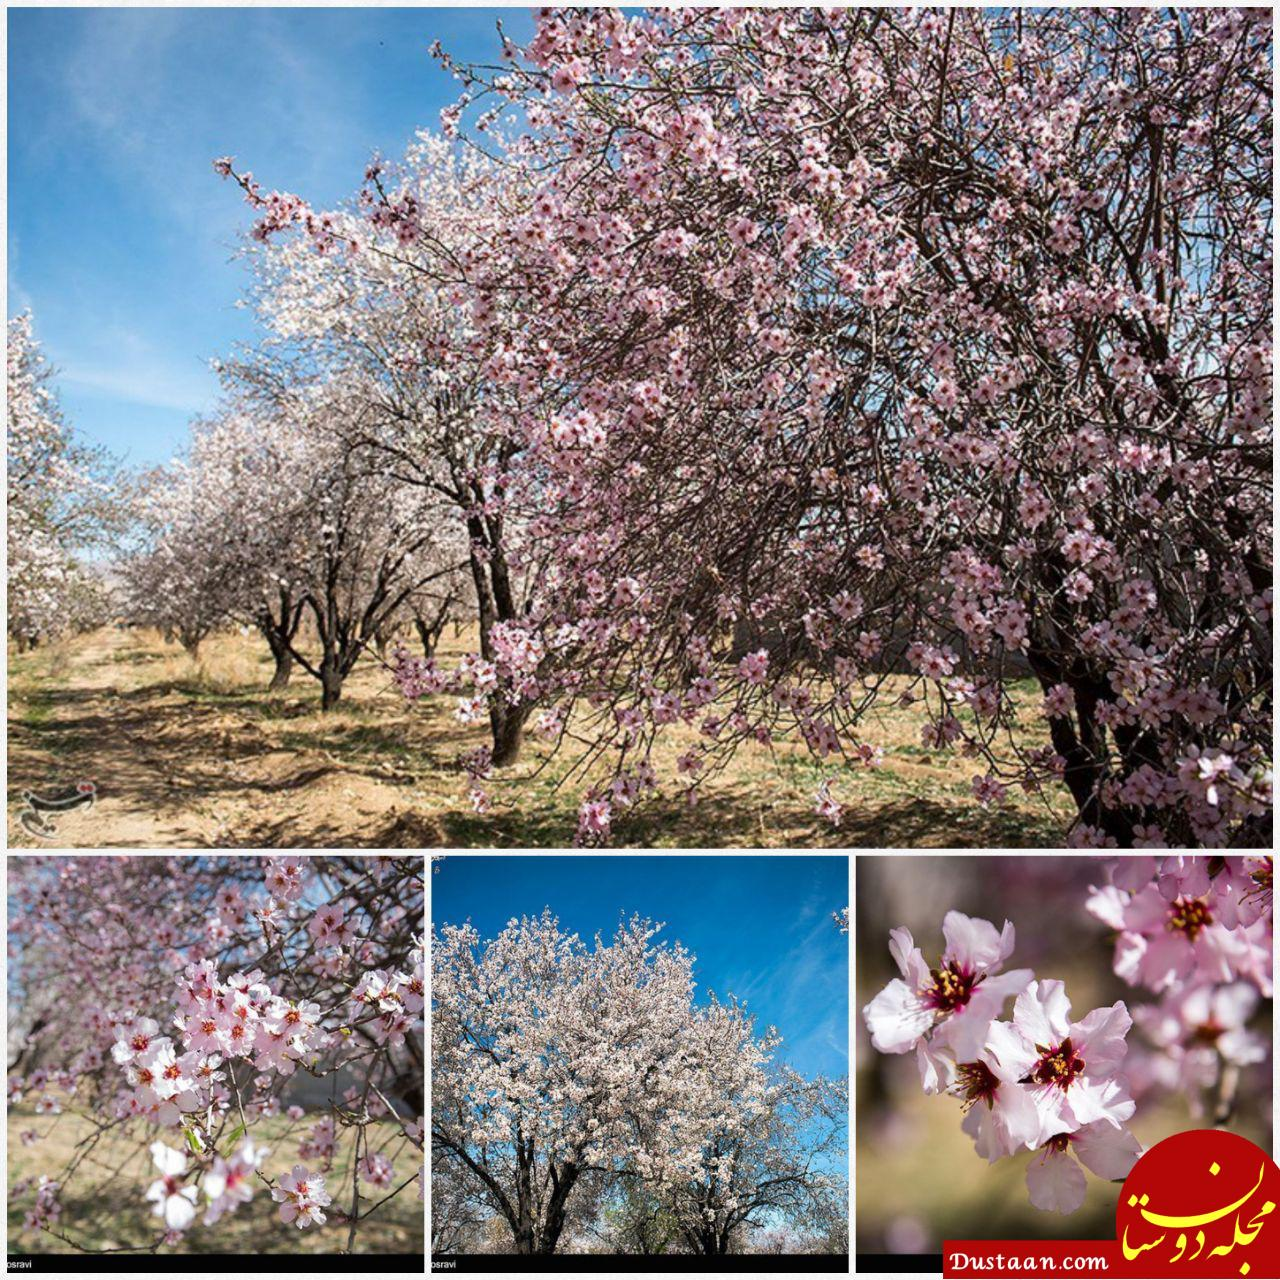 www.dustaan.com تصویری دیدنی از شکوفه های زمستانی شیراز